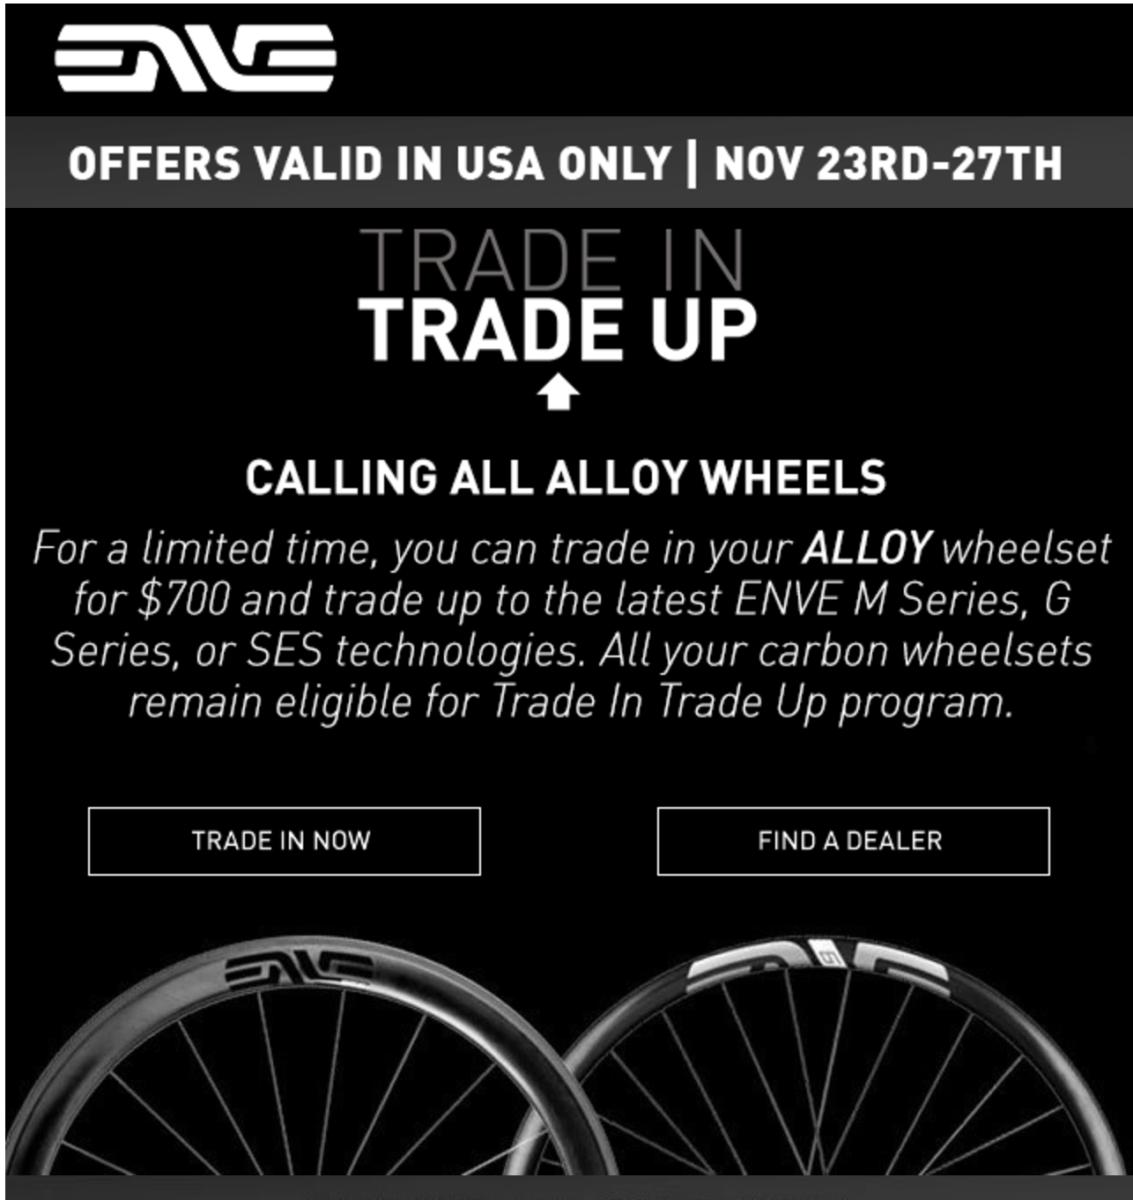 Holiday 2018 Sports Tech Deals!